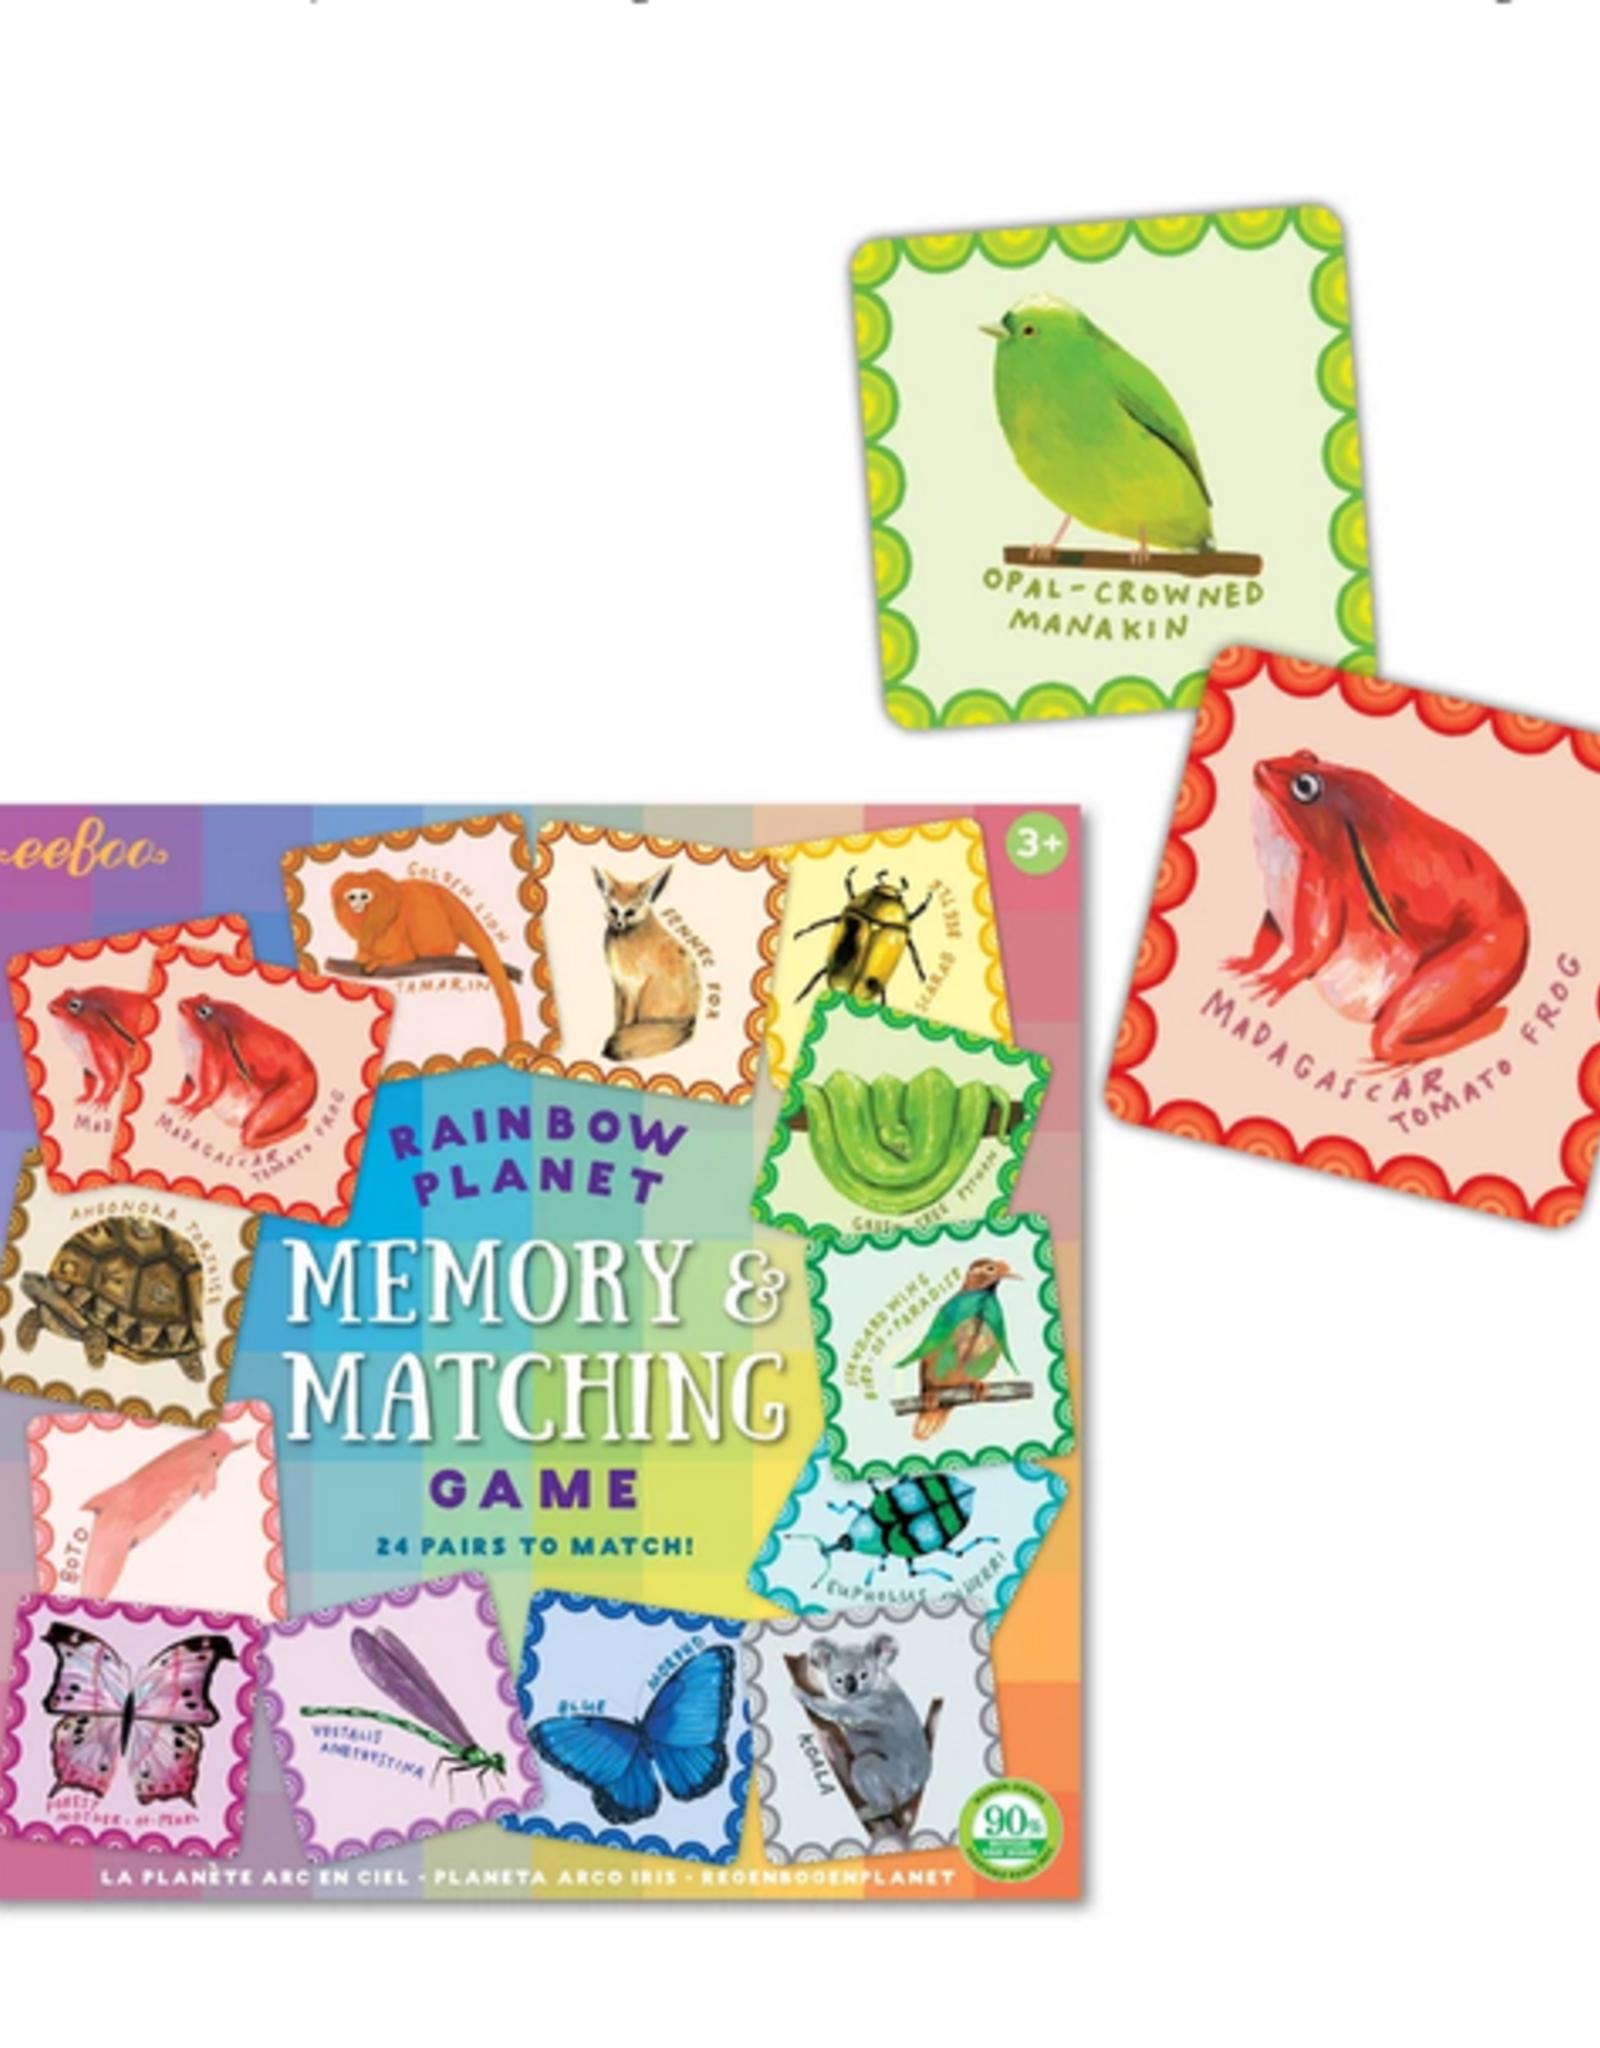 Rainbow Planet Memory Matching Game